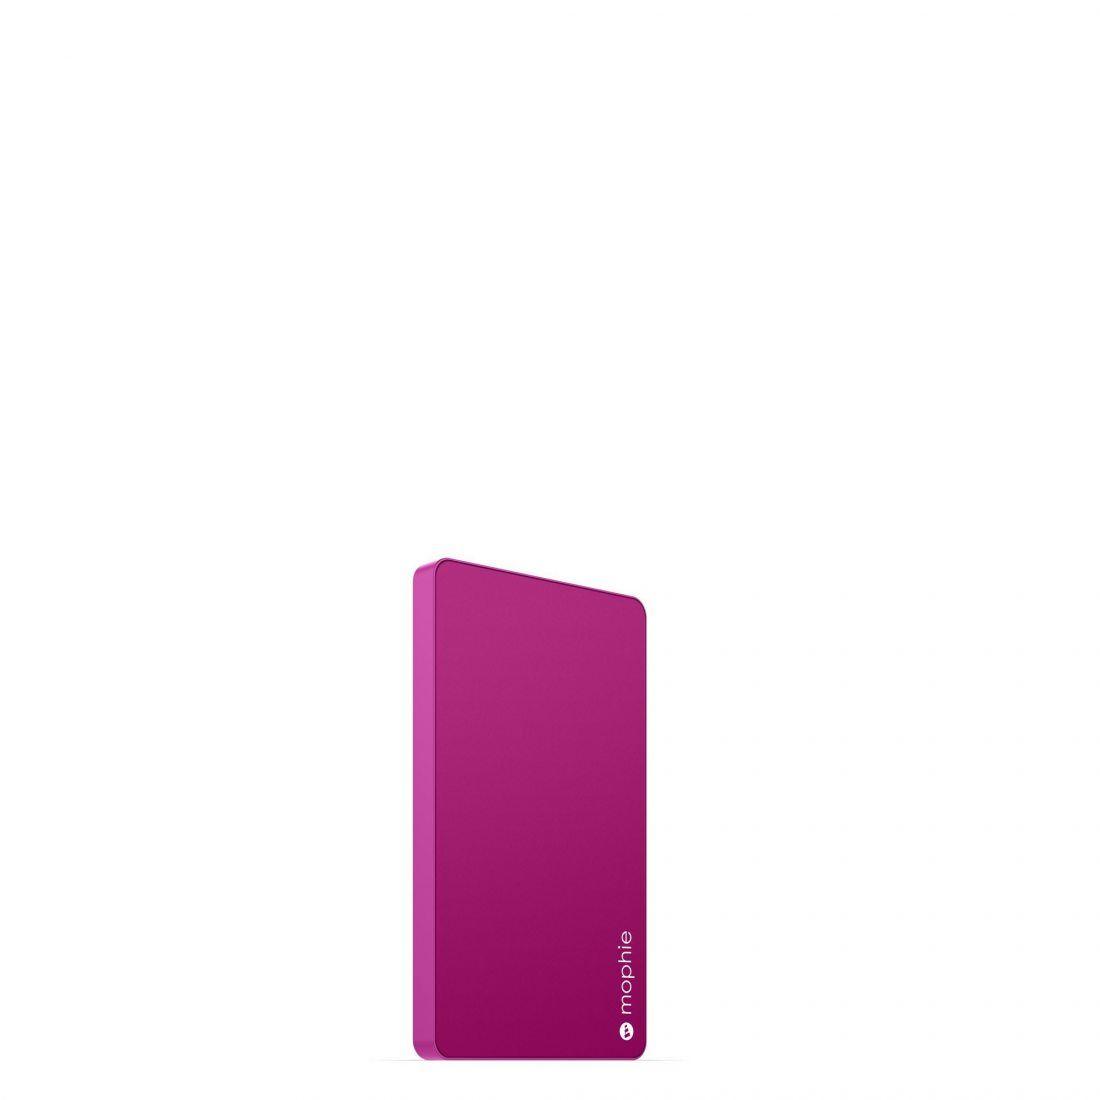 Mophie Powerstation Mini Batterie Externe Rose